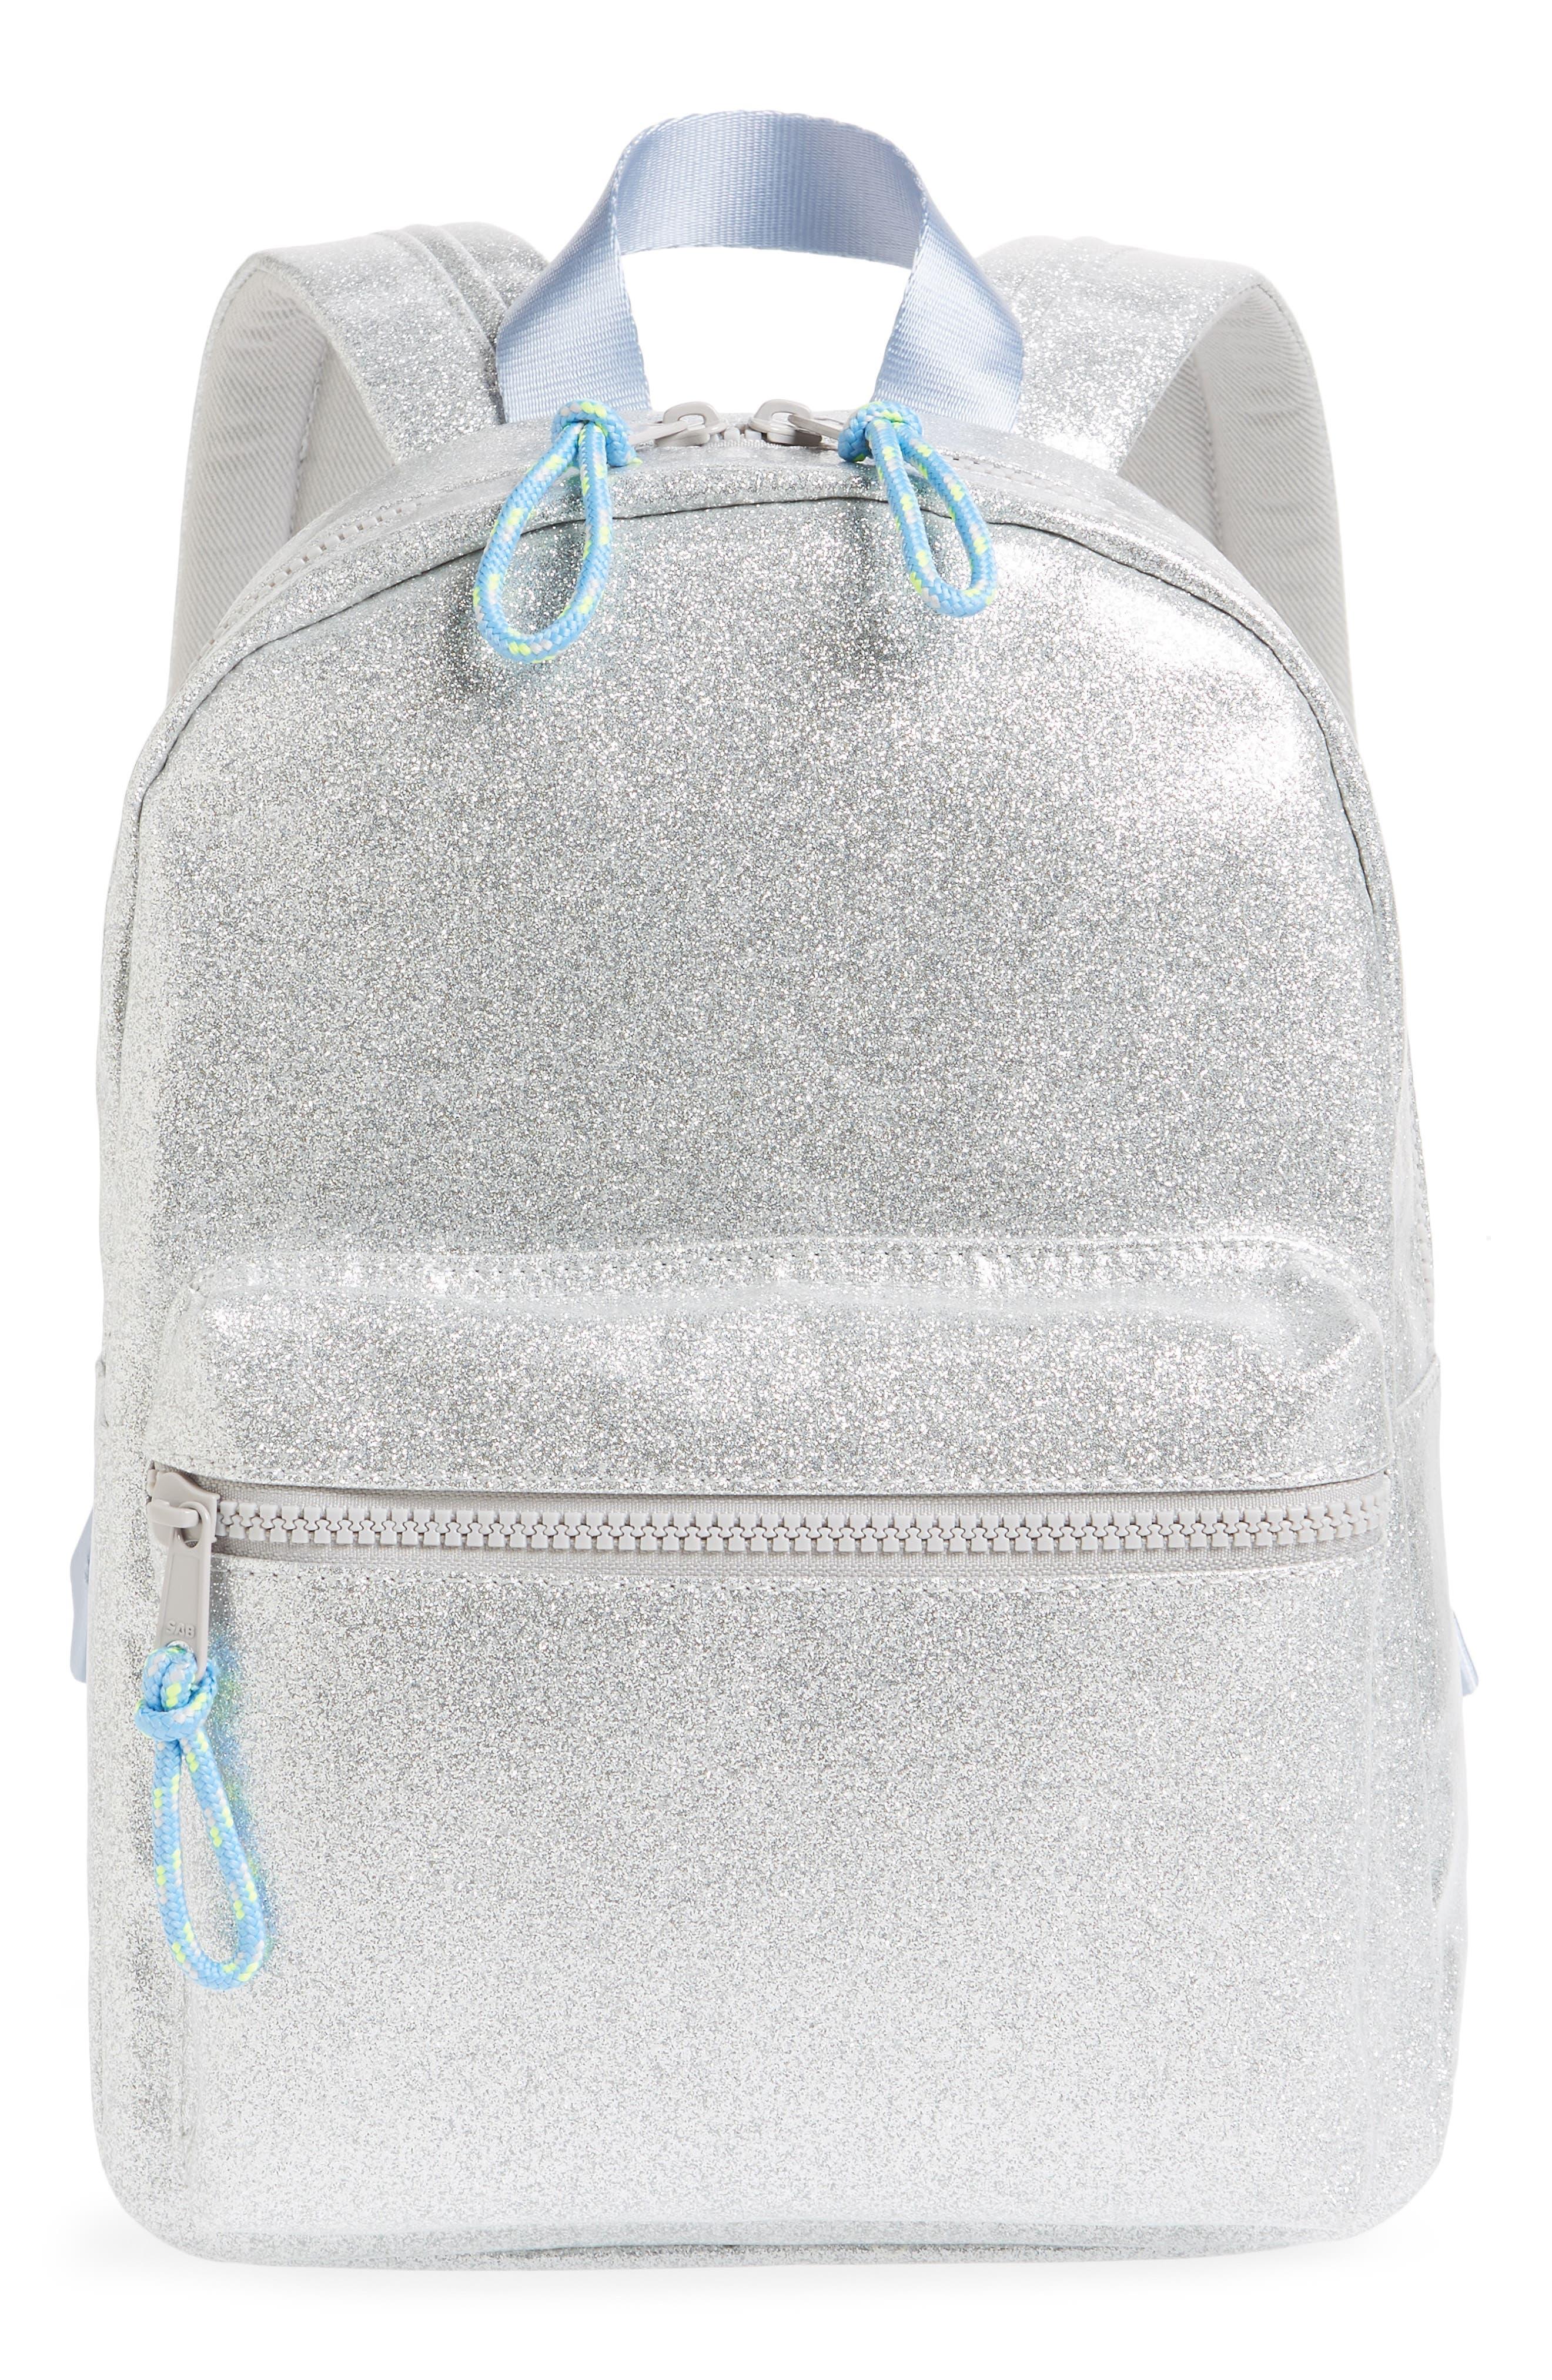 Glitter Mini Backpack,                             Main thumbnail 1, color,                             MORNING FOG